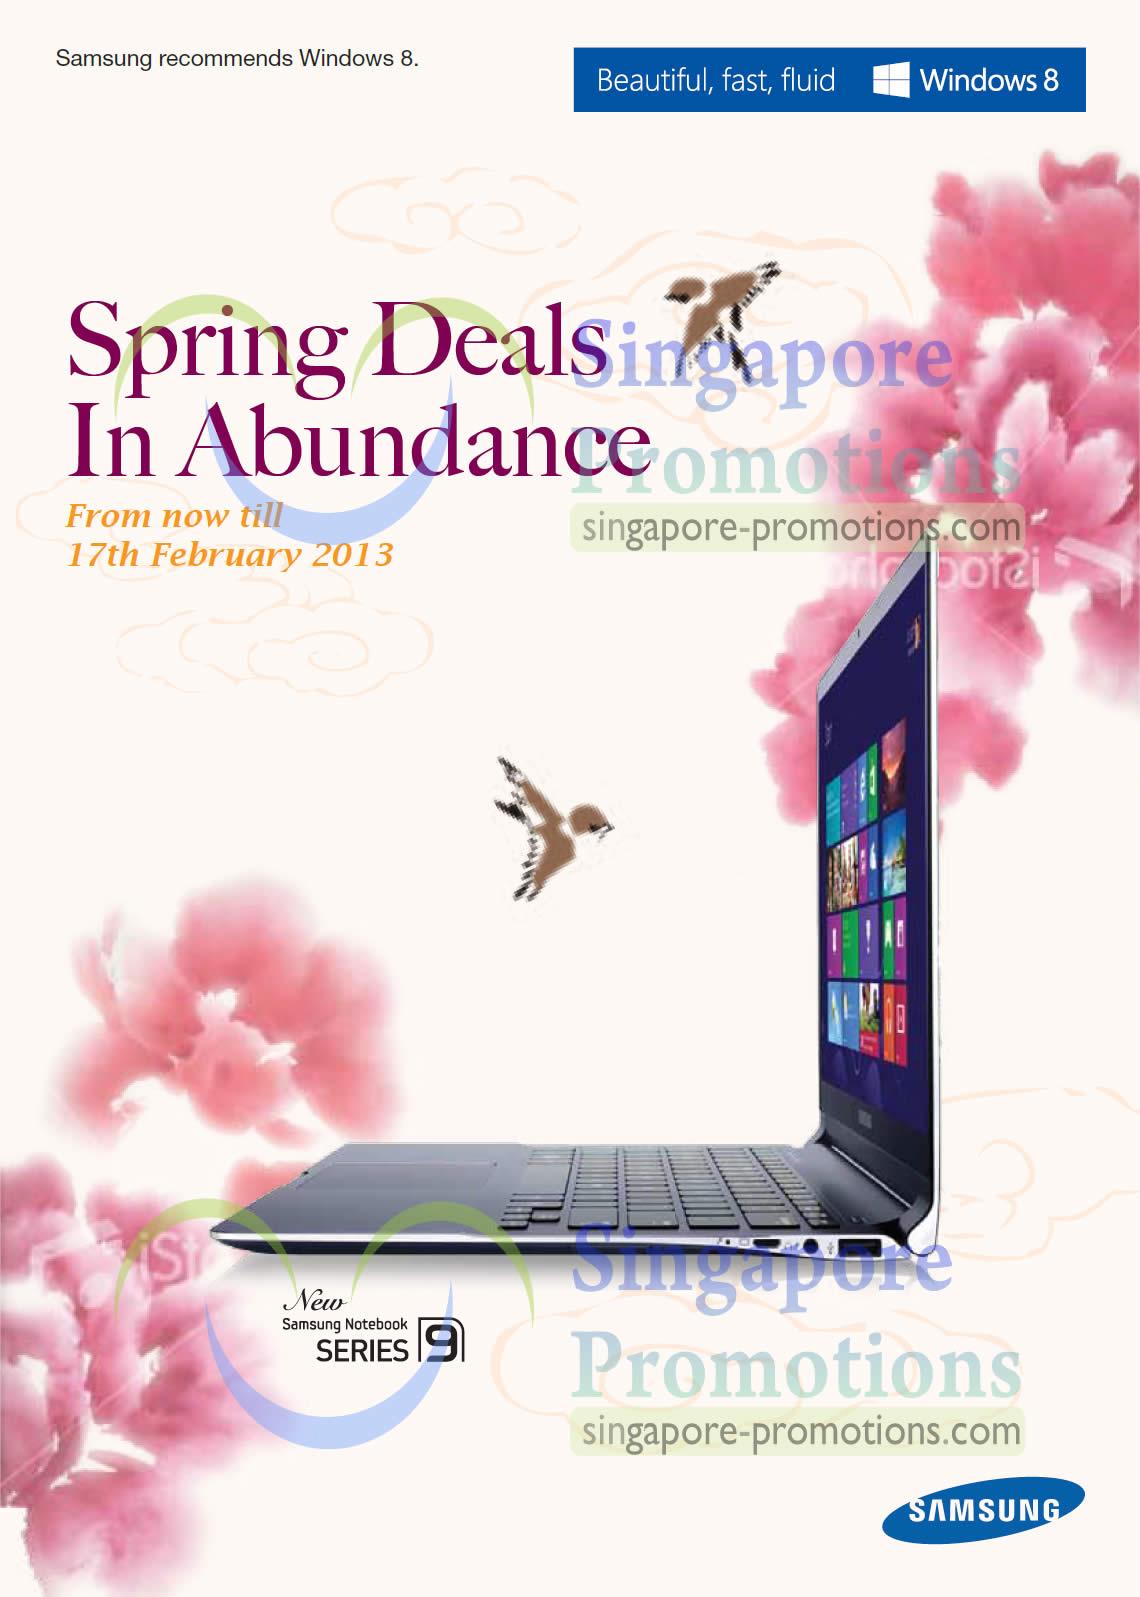 Samsung Spring Deals